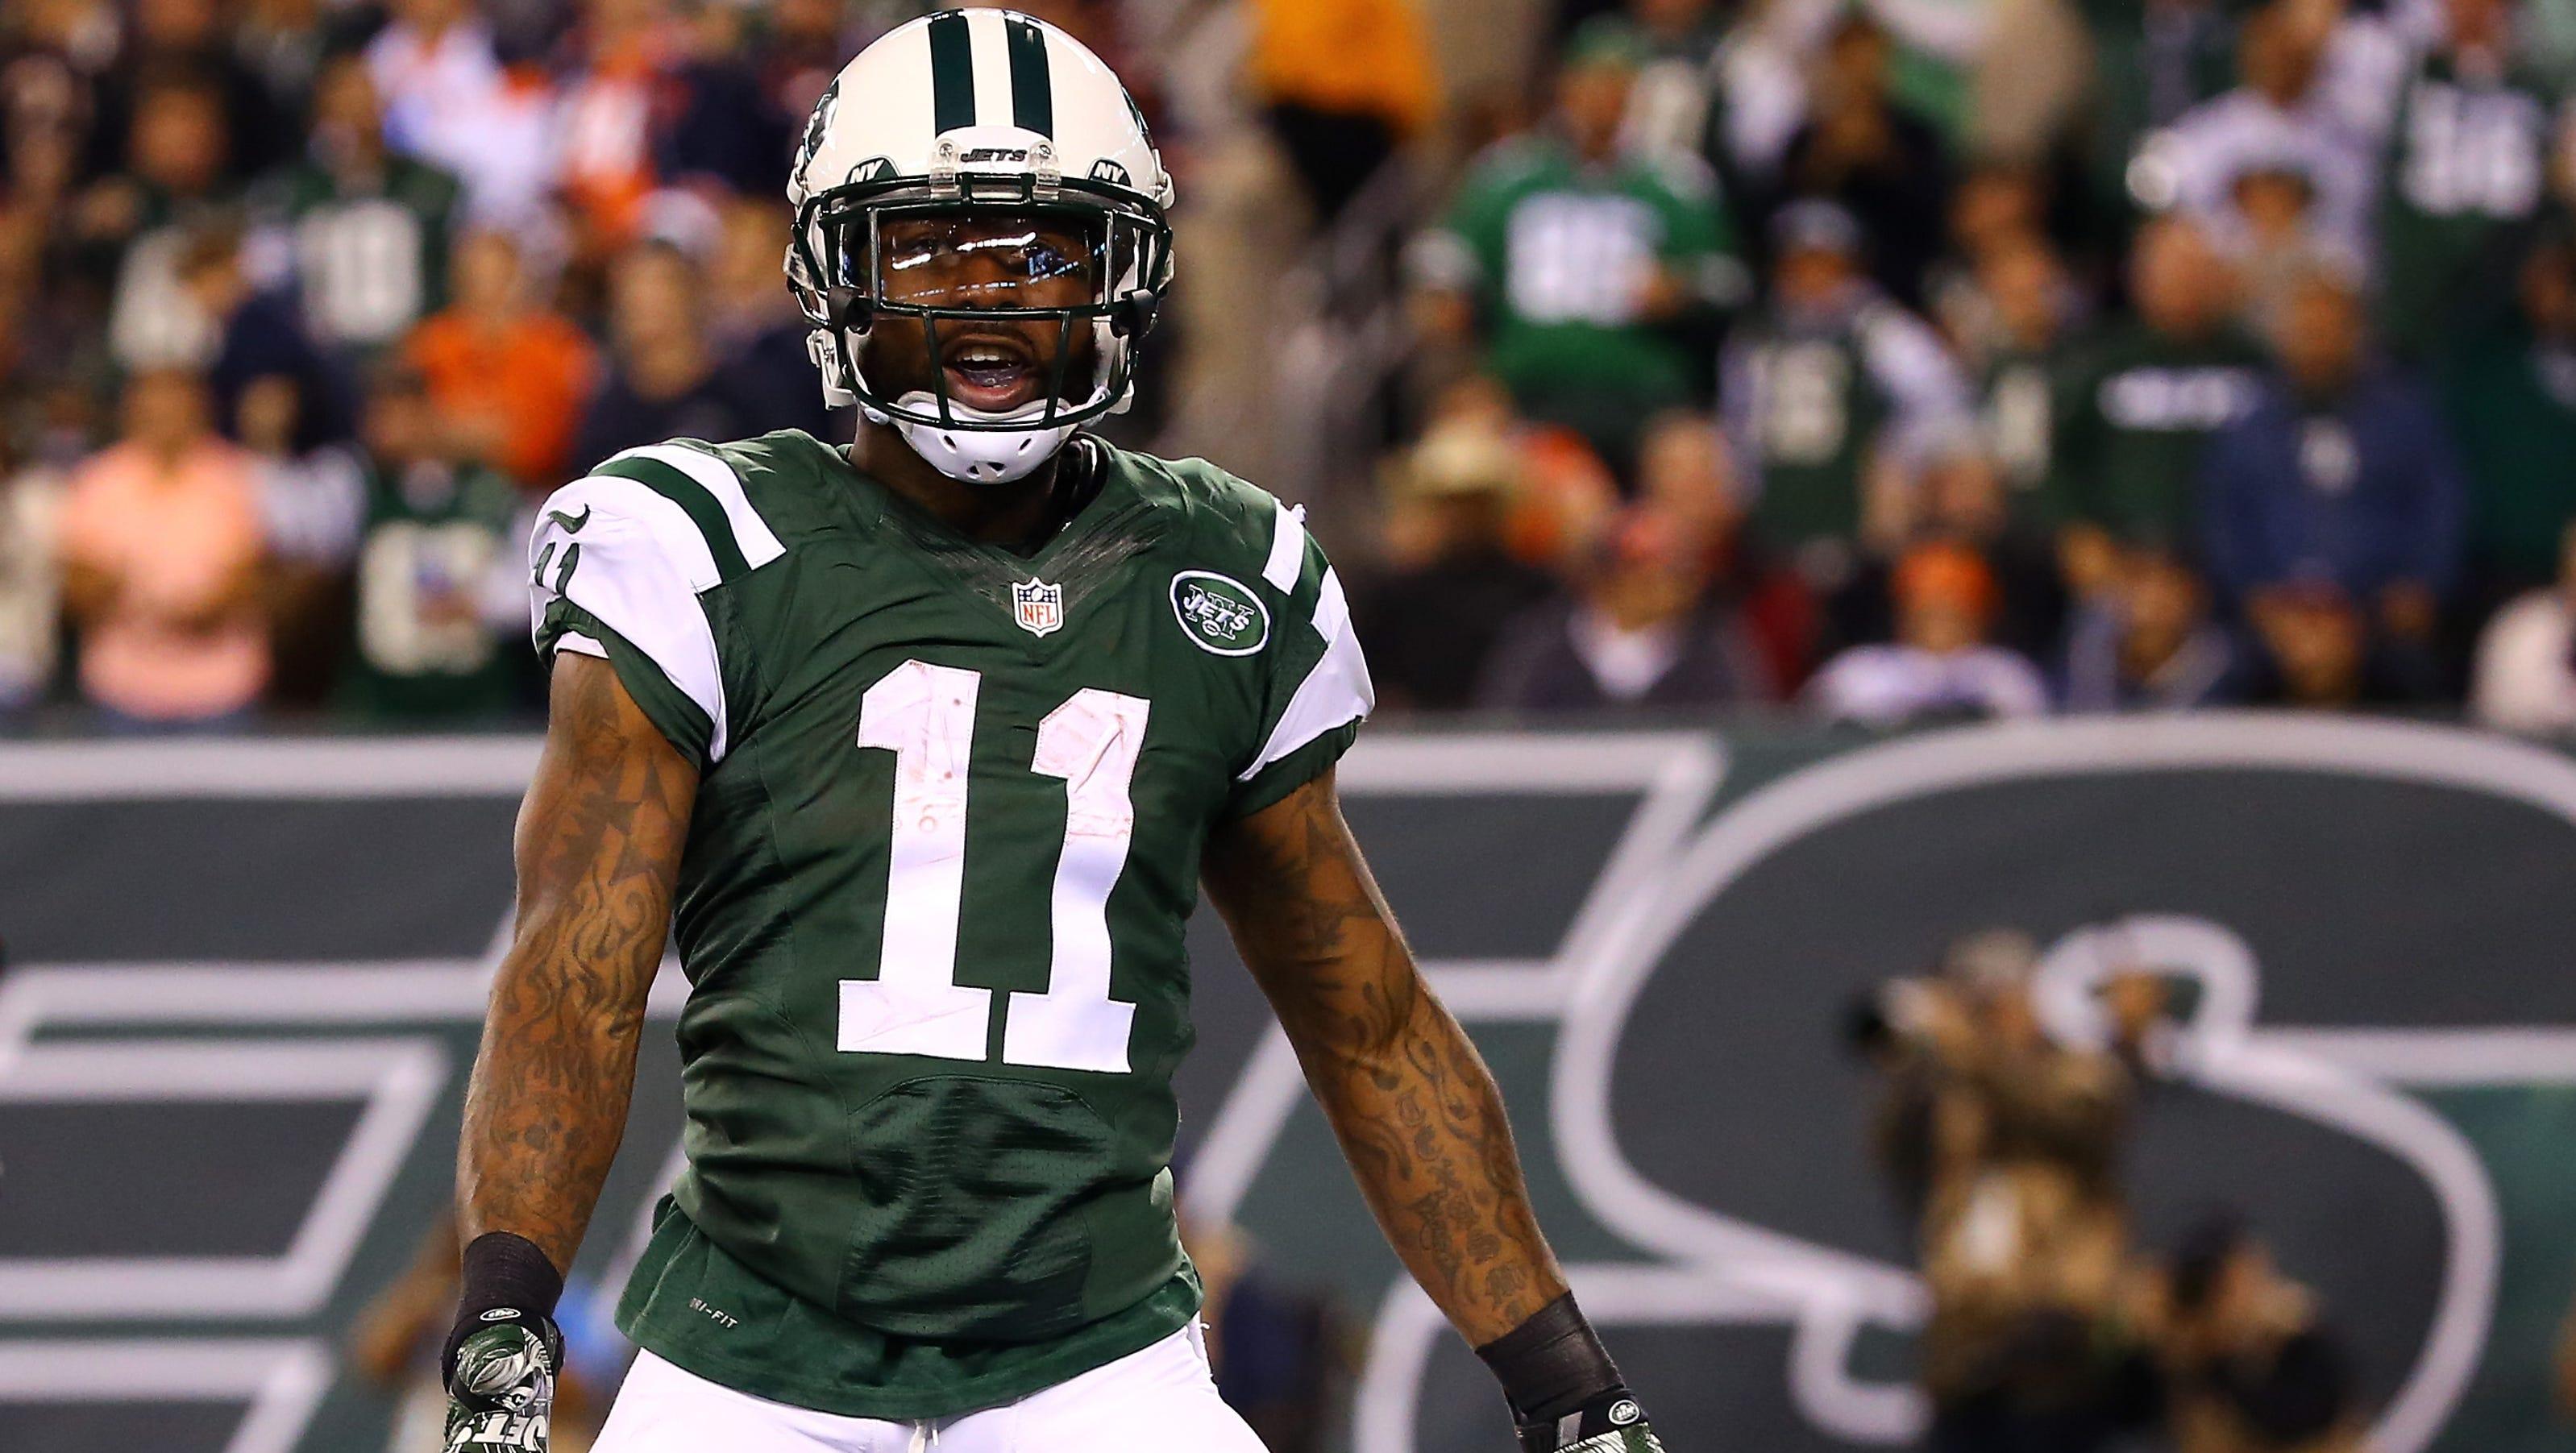 Nike NFL Jerseys - Detroit Lions will be mindful of Jets' Jeremy Kerley - Detroit ...